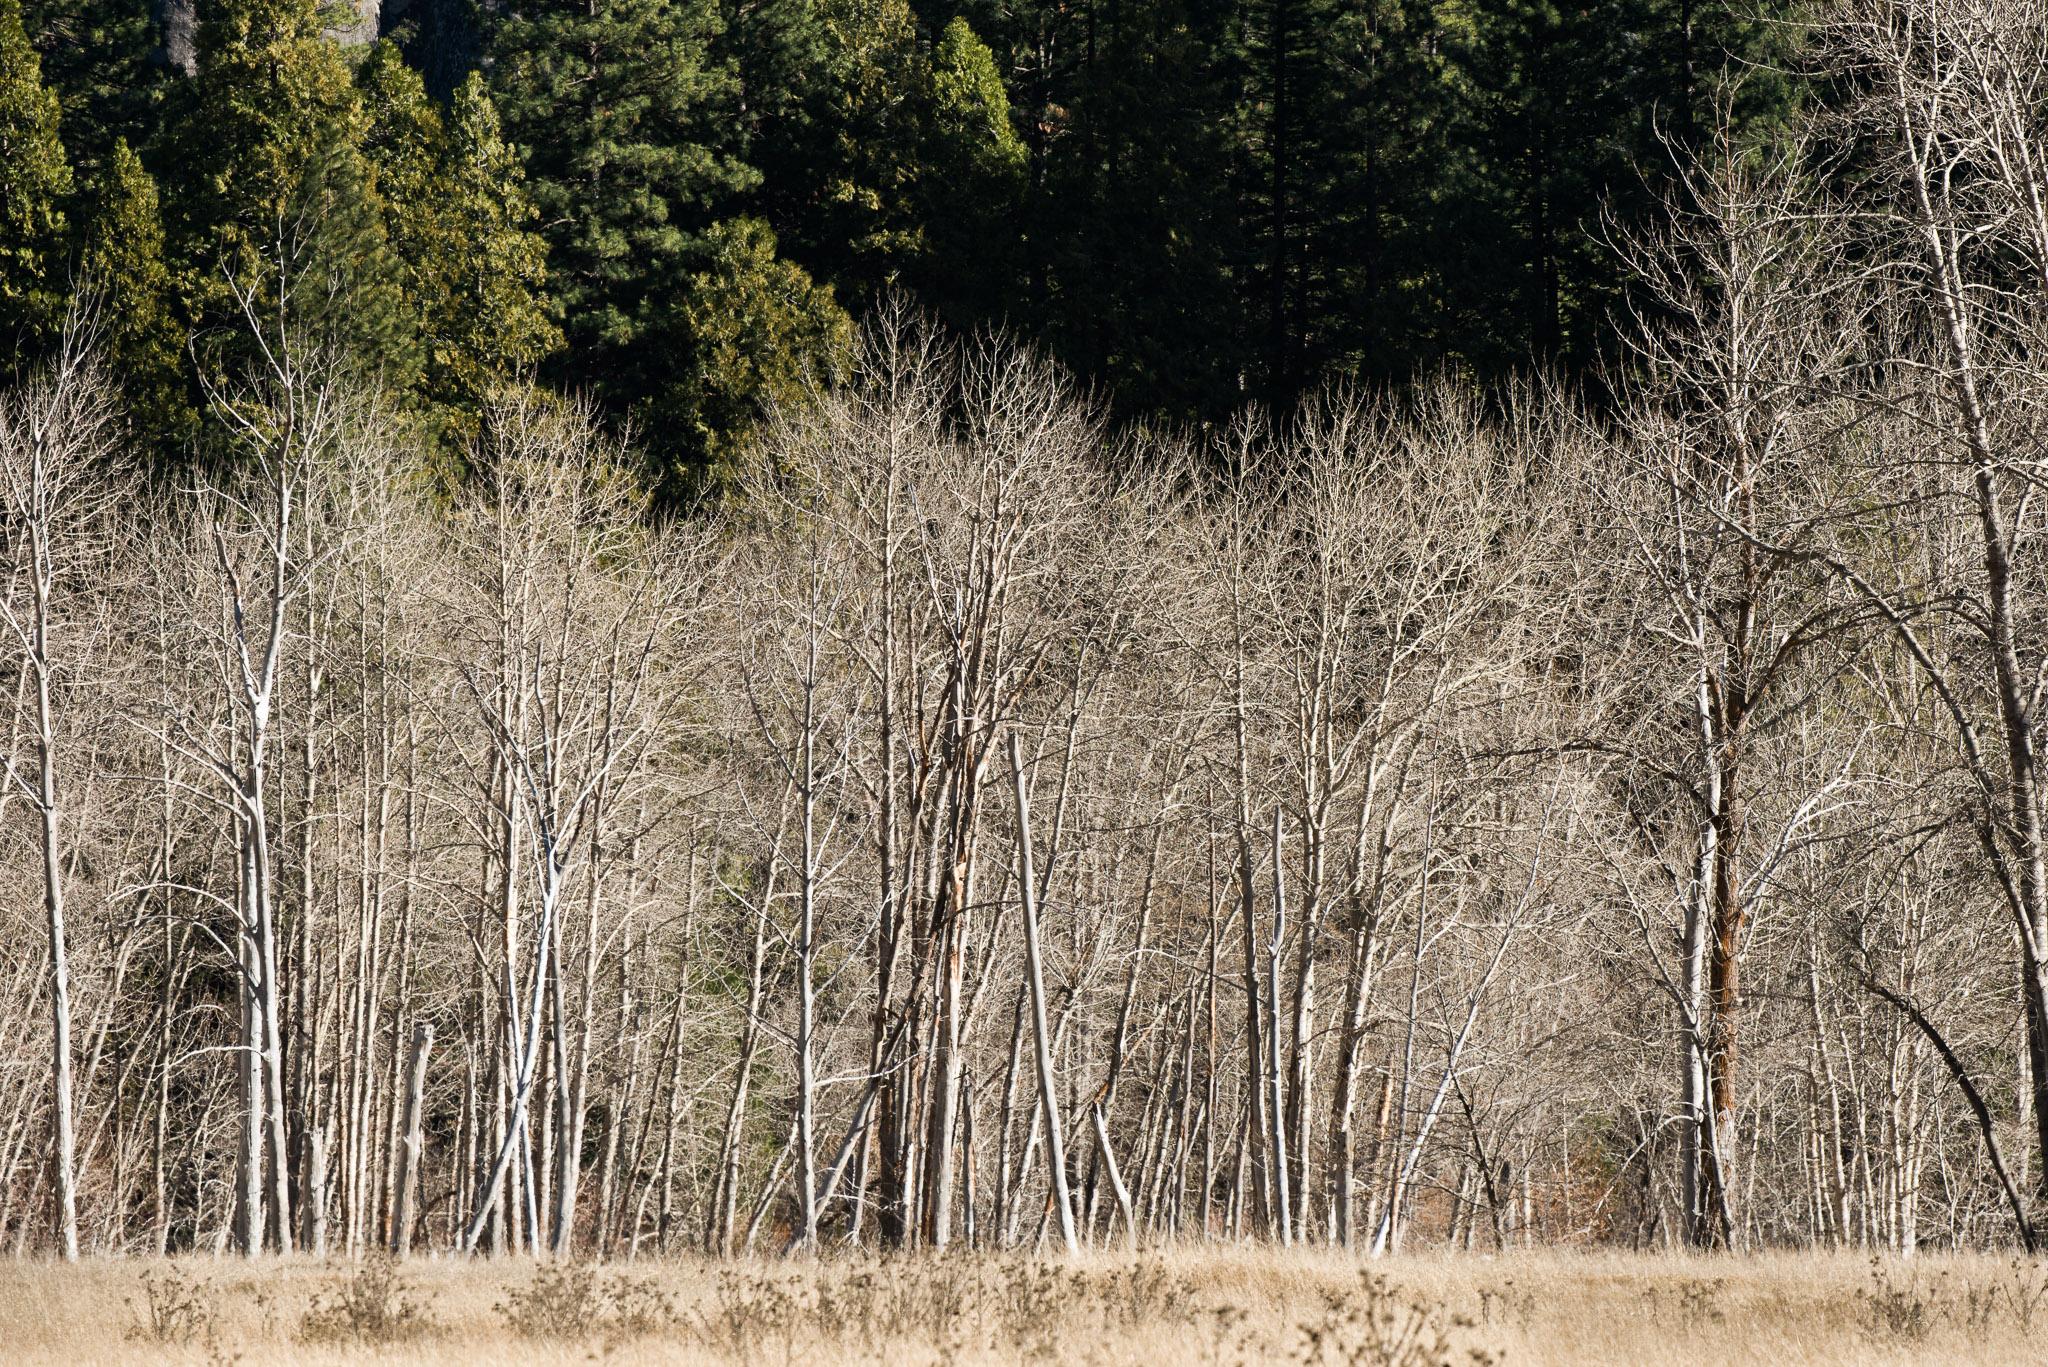 Jason-Davis-Images-Yosemite-0029.jpg